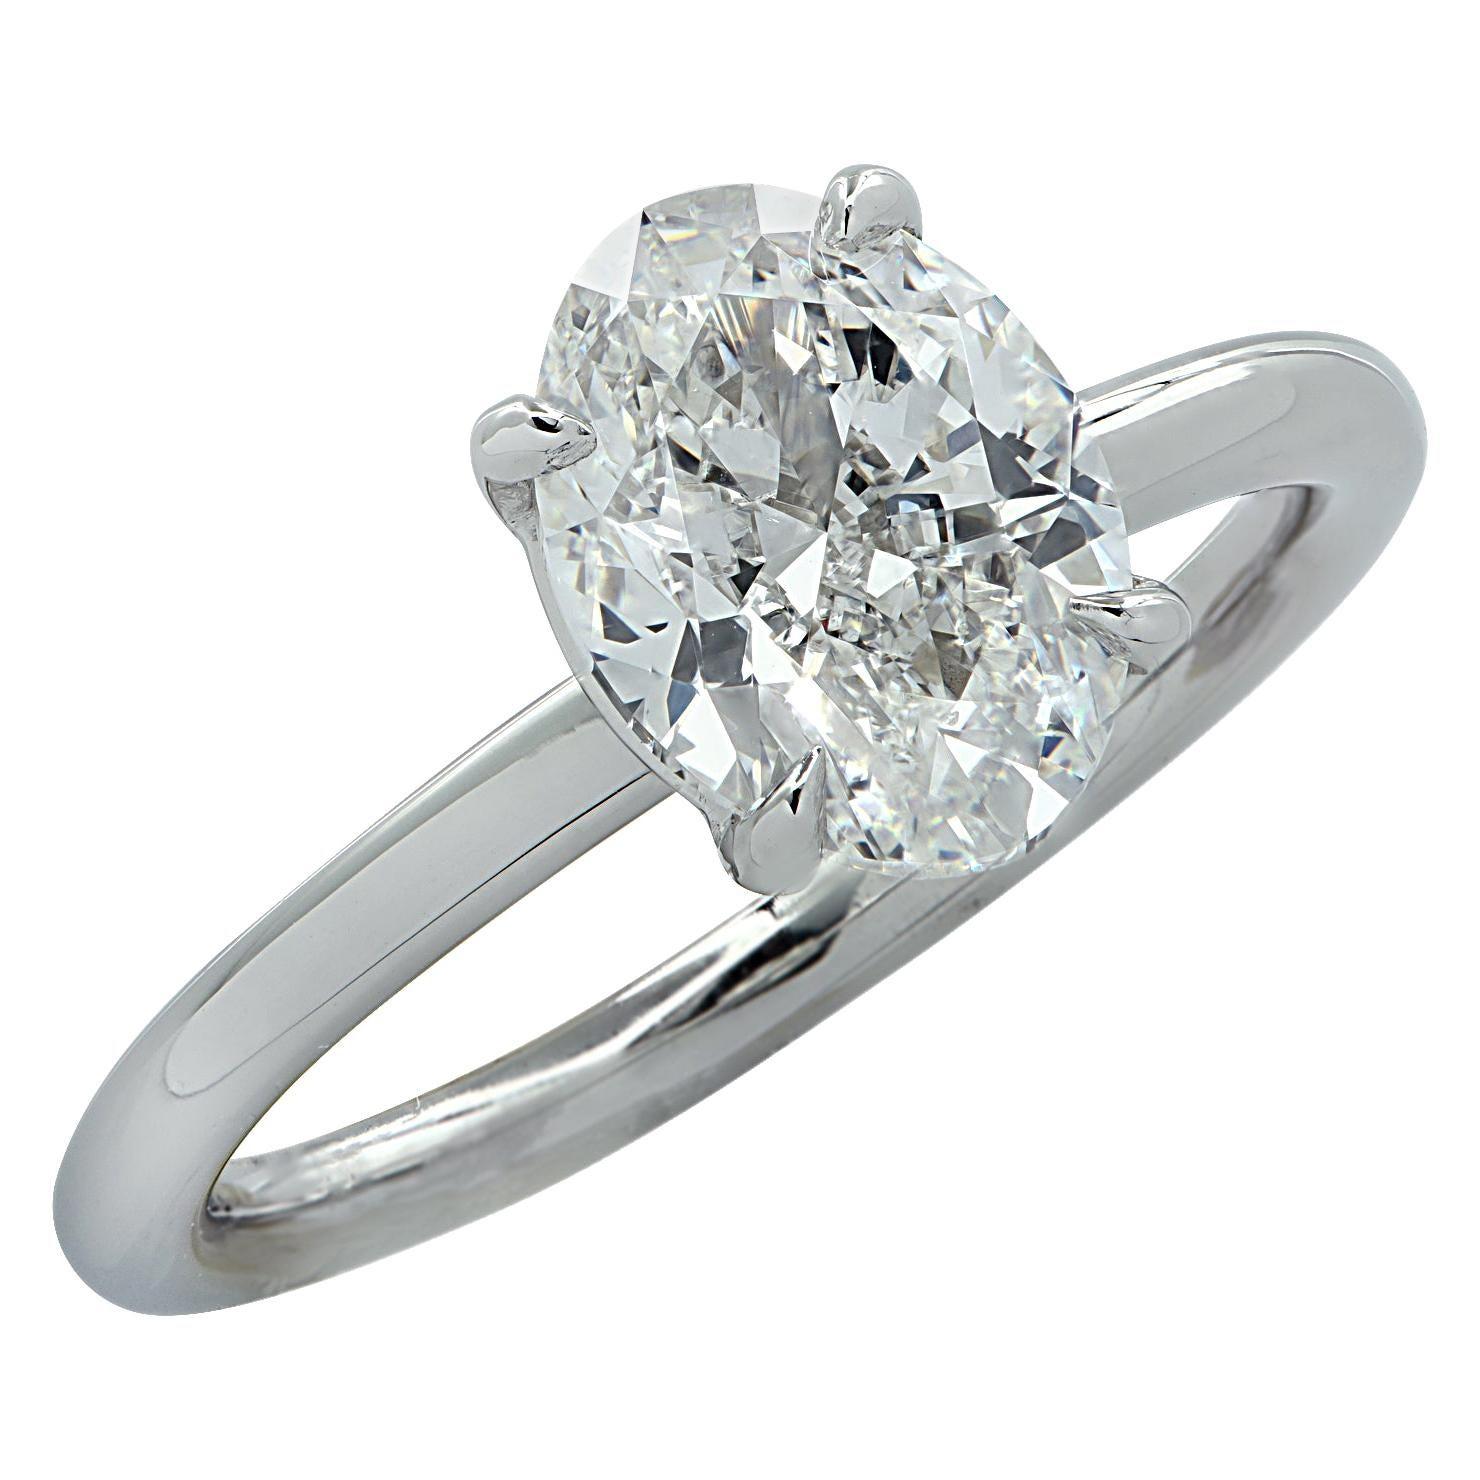 Vivid Diamonds GIA Certified 1.80 Carat Oval Diamond Engagement Ring